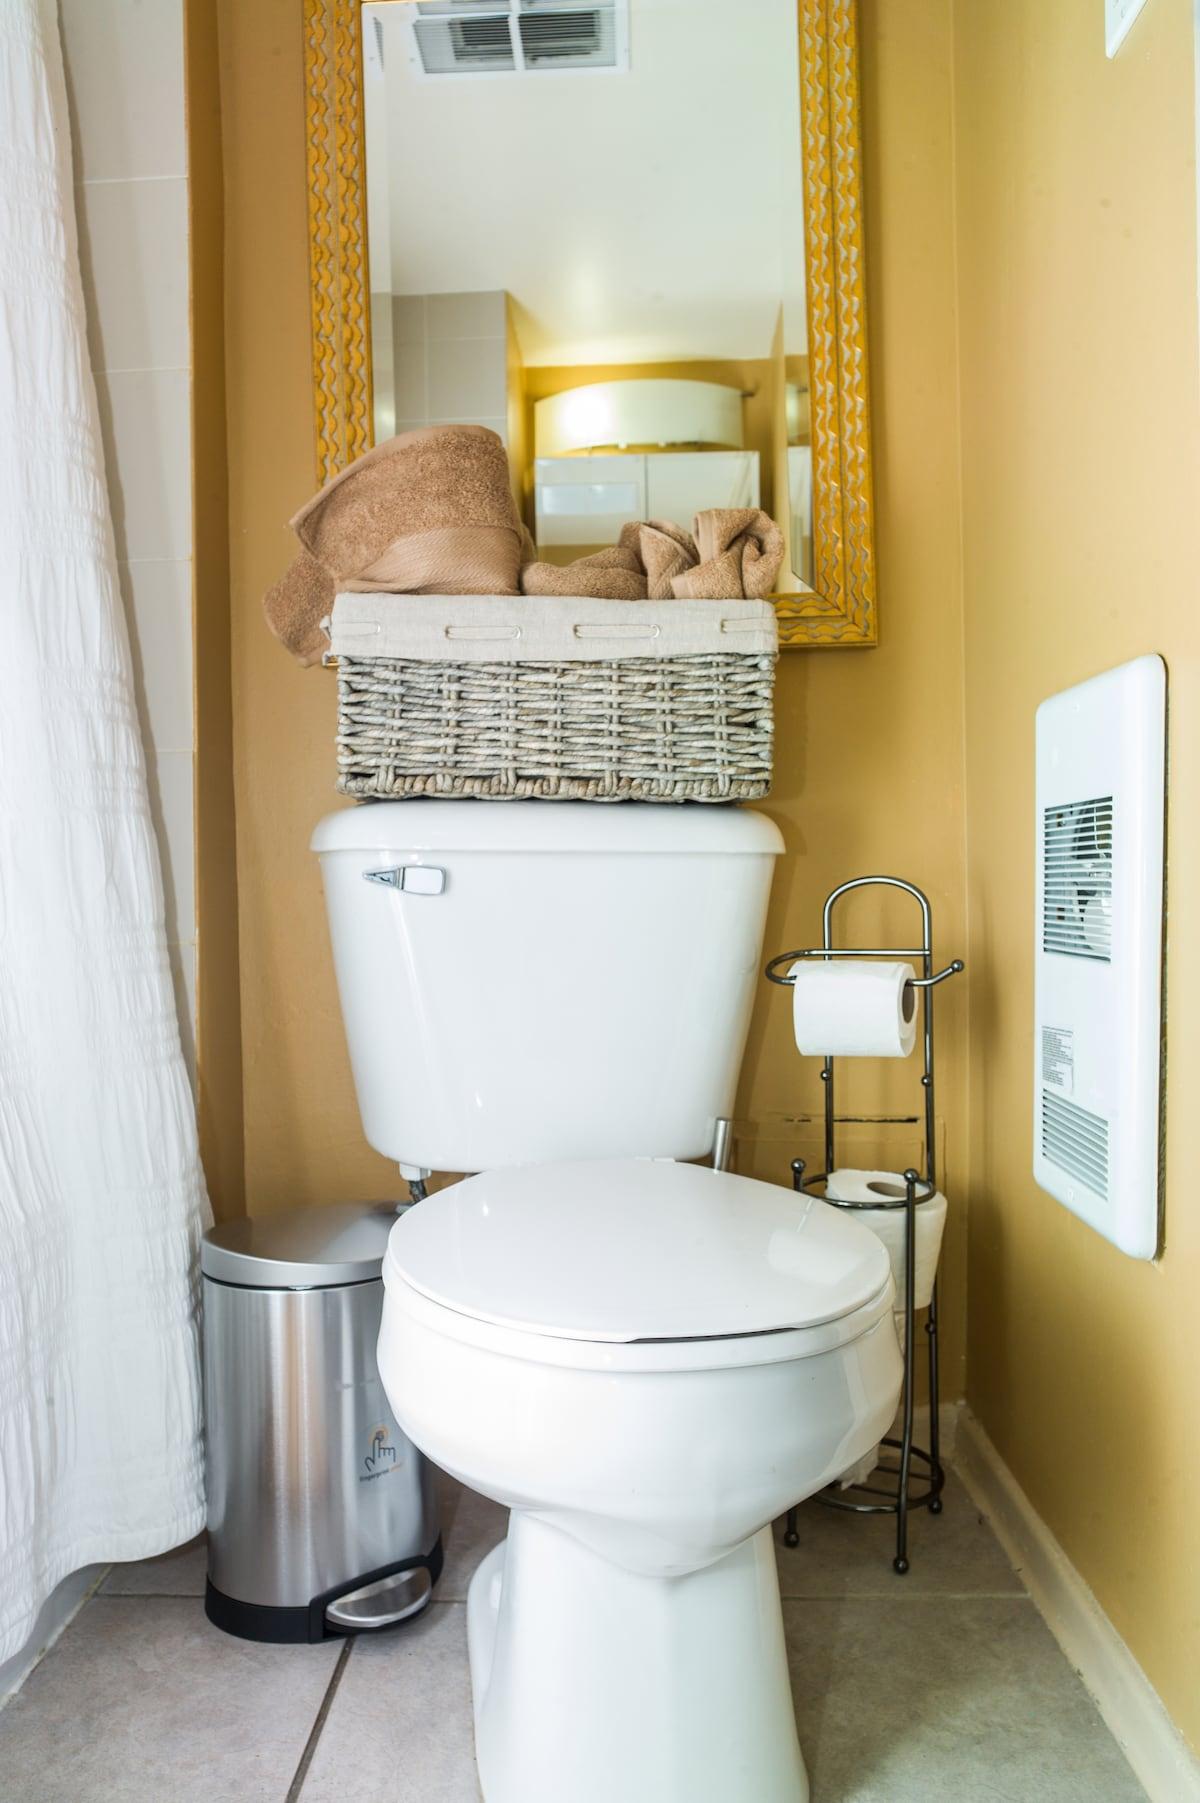 Bathroom, sink, toilet, great shower. Feel good, look good!